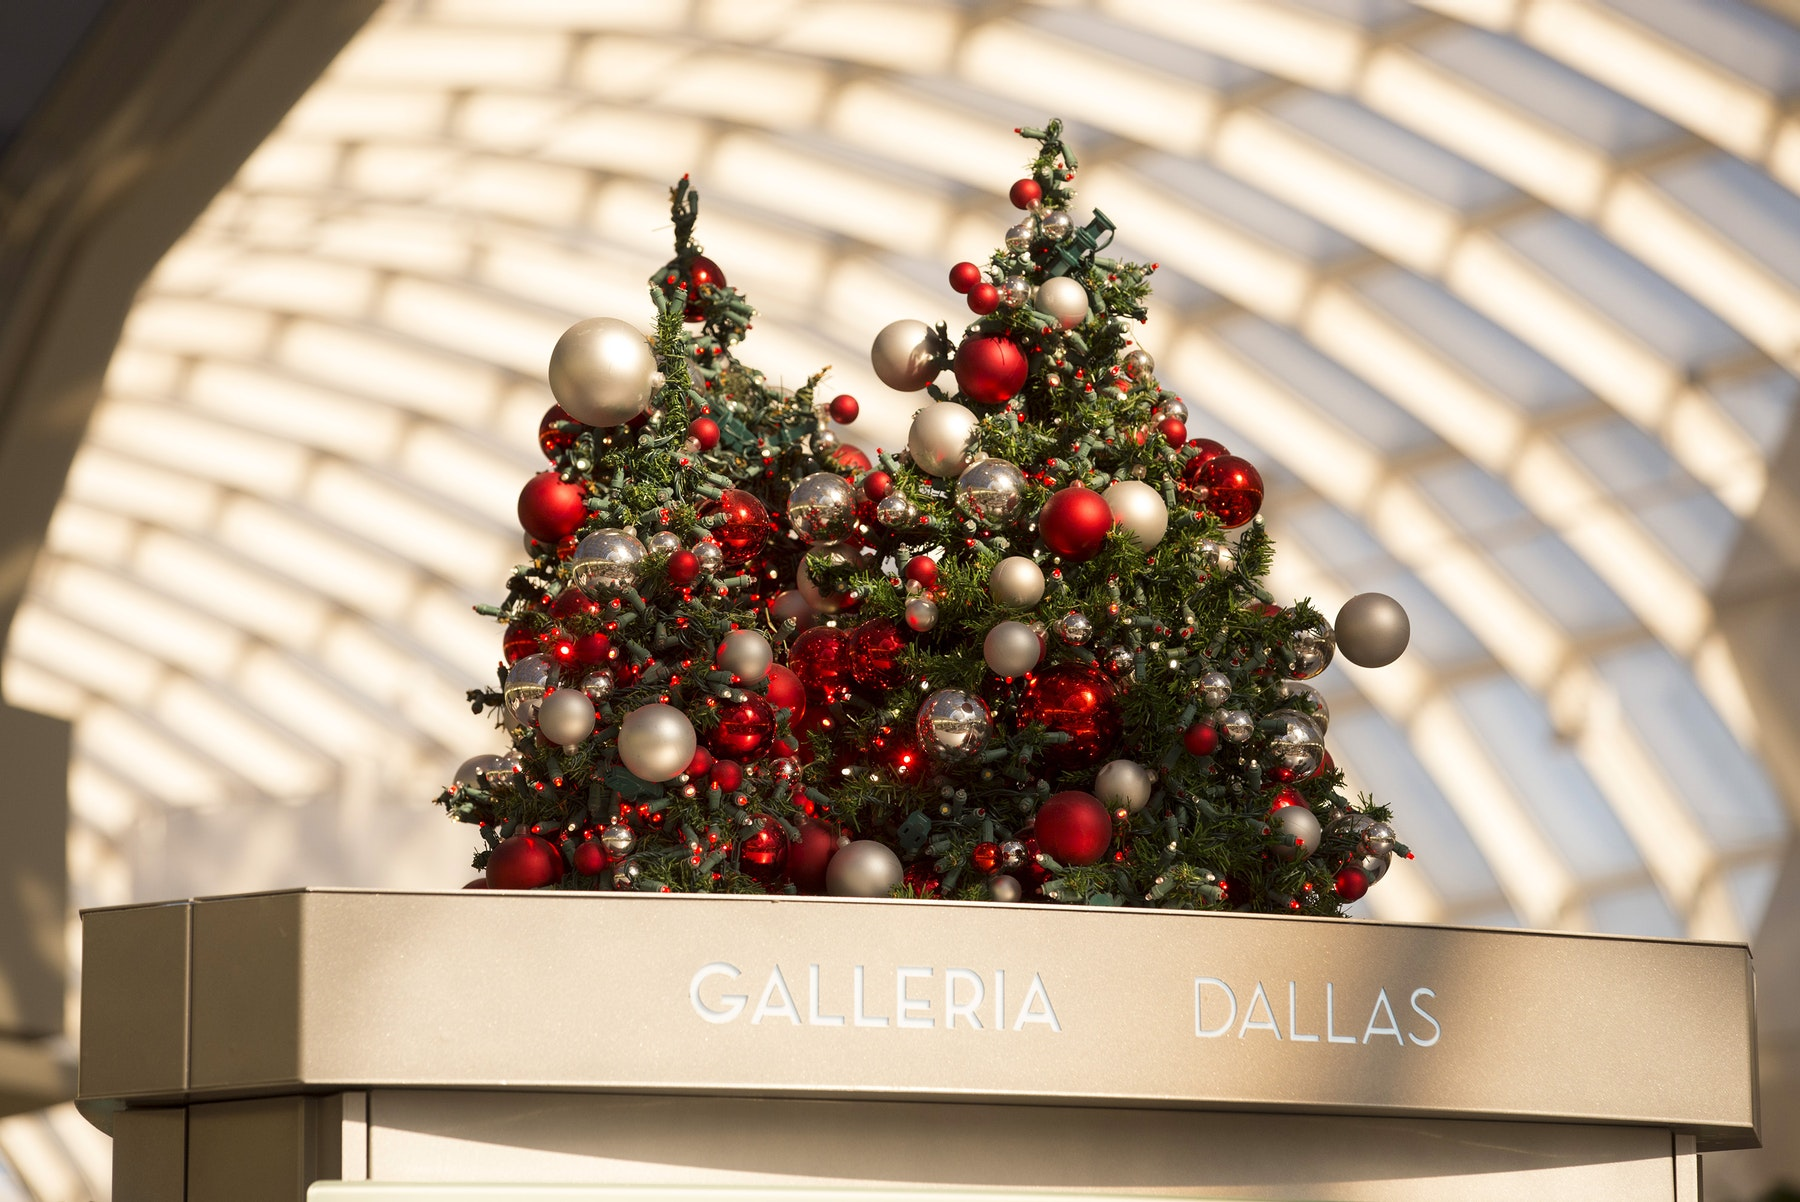 Visit Santa at Galleria Dallas